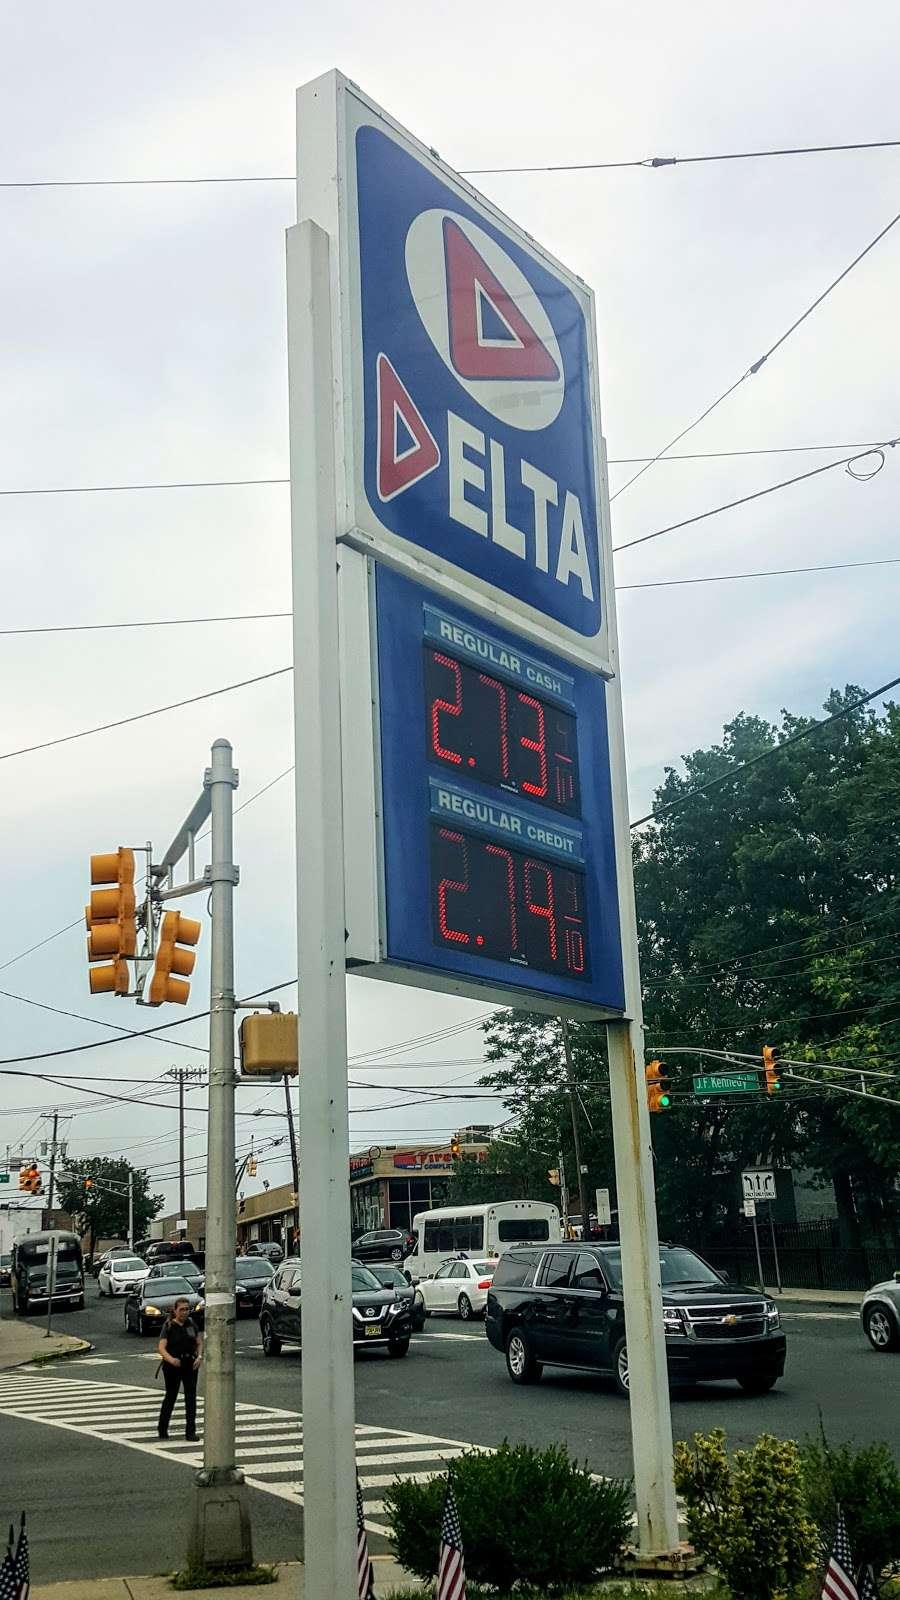 Delta Gas Station - gas station  | Photo 5 of 9 | Address: 9280 John Fitzgerald Kennedy Blvd, North Bergen, NJ 07047, USA | Phone: (201) 854-3800